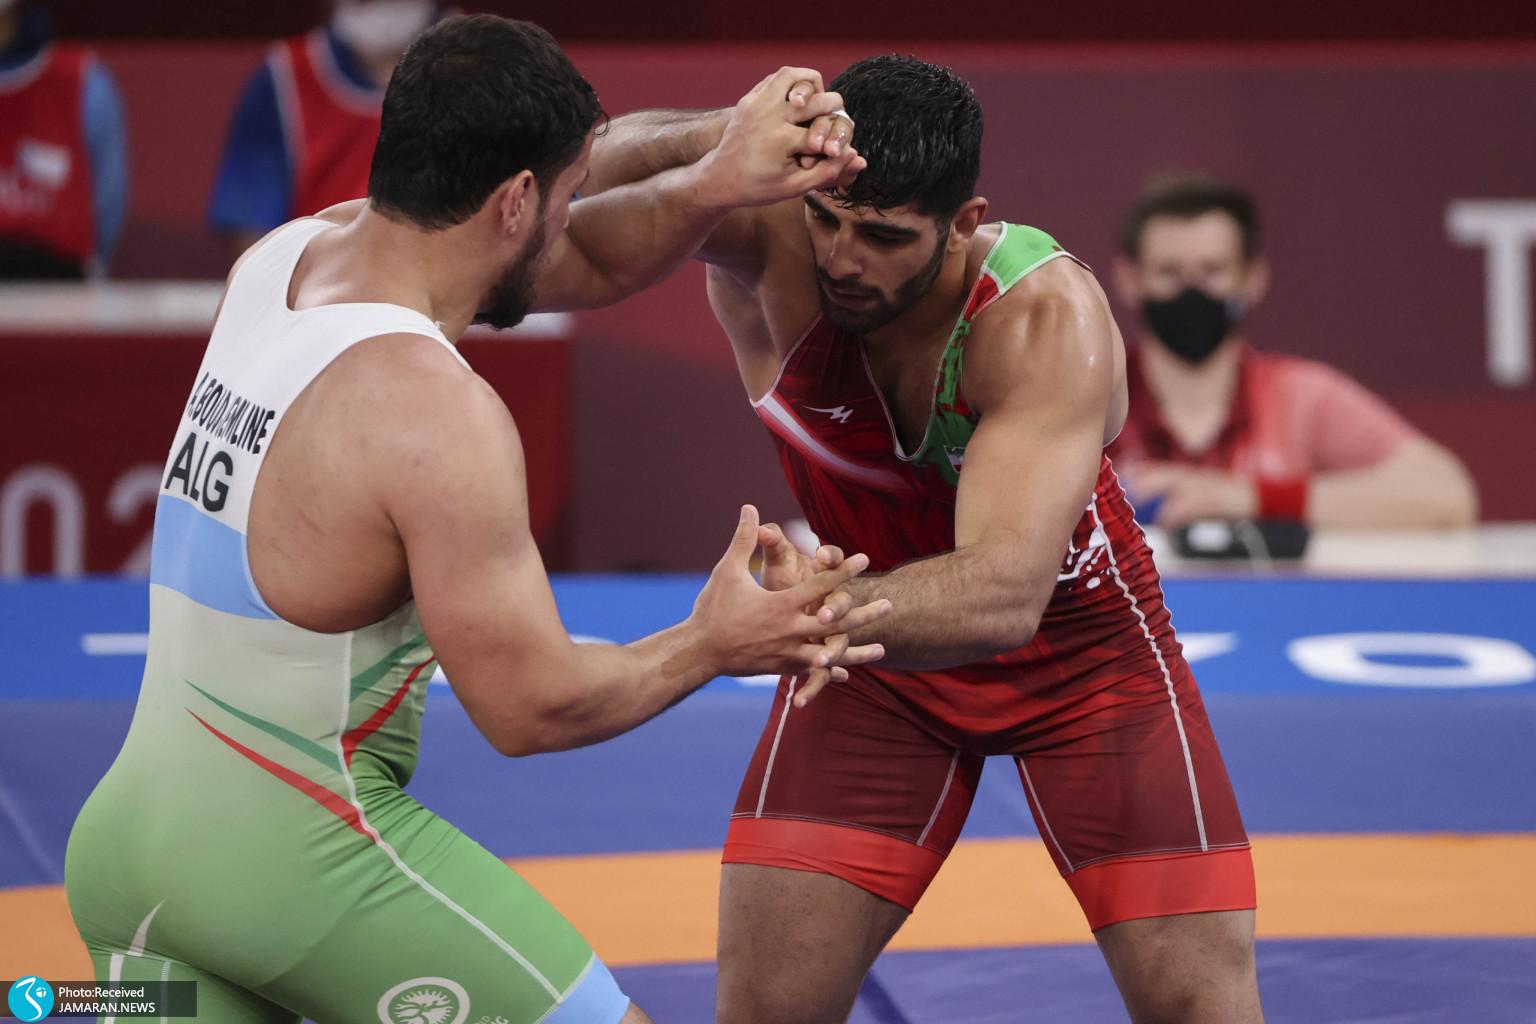 محمدهادی ساروی در کشتی فرنگی المپیک